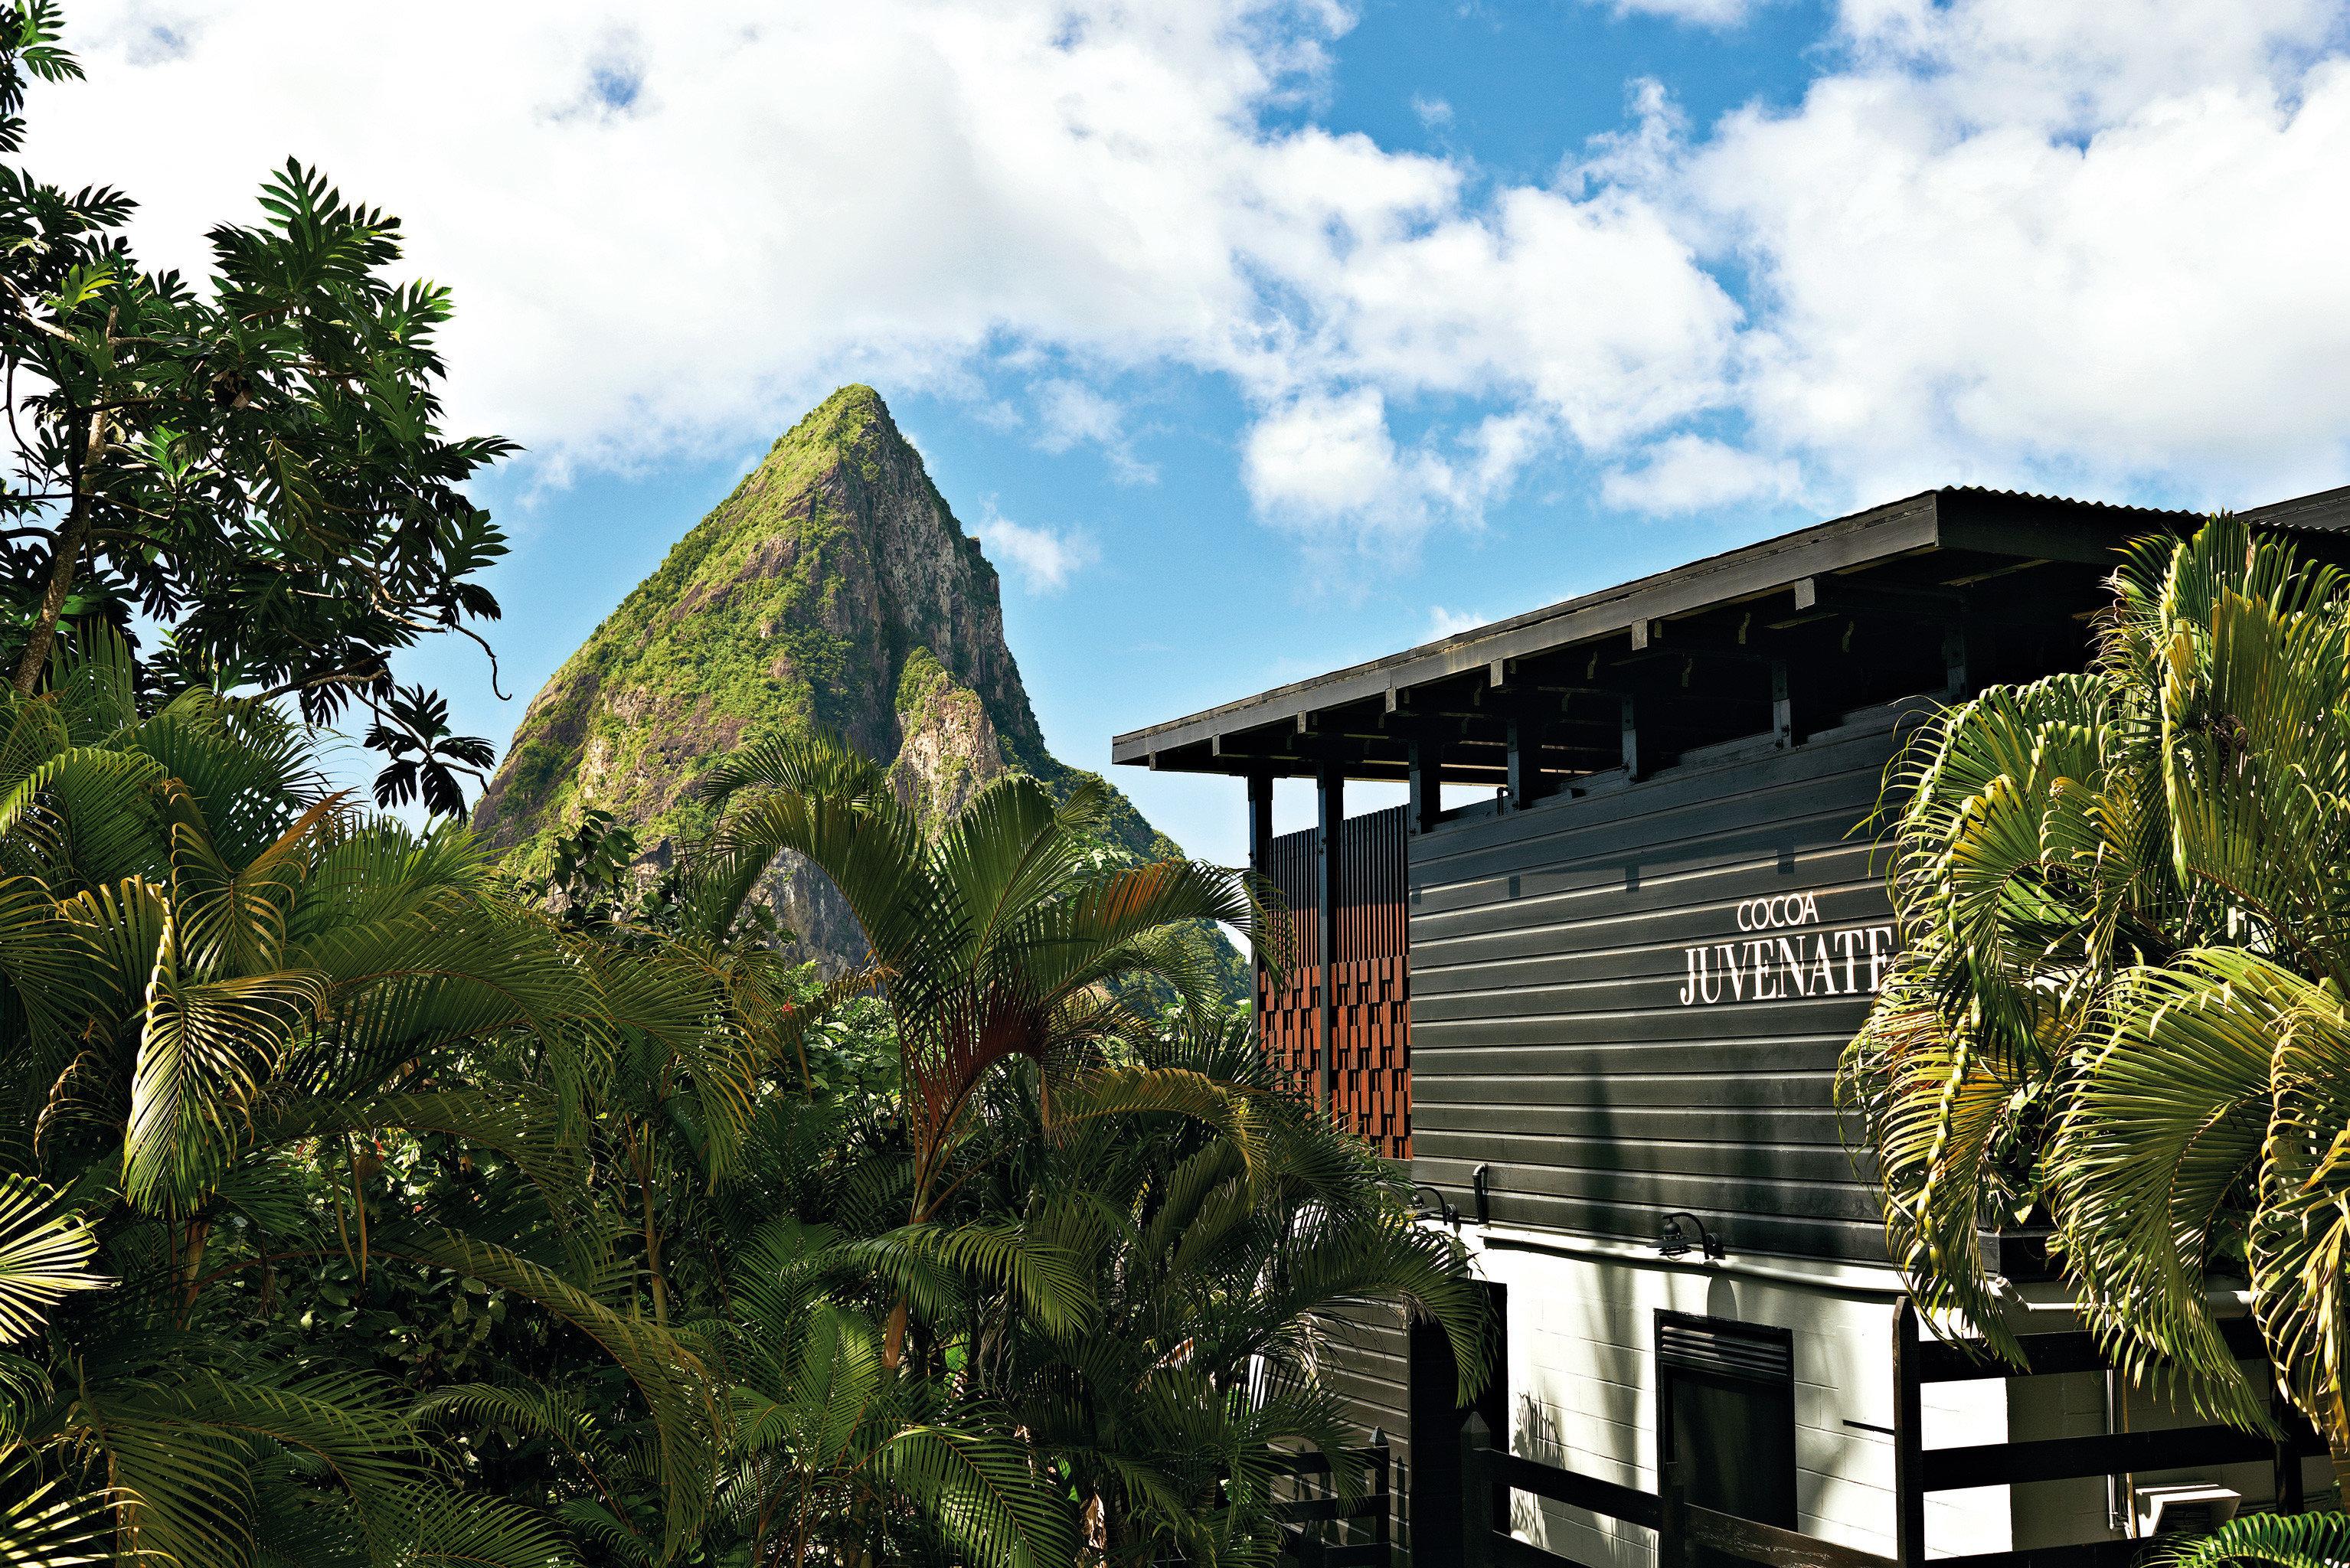 Architecture Buildings Exterior Hotels Mountains Romance Scenic views sky tree landmark house mountain plant Resort mountain range